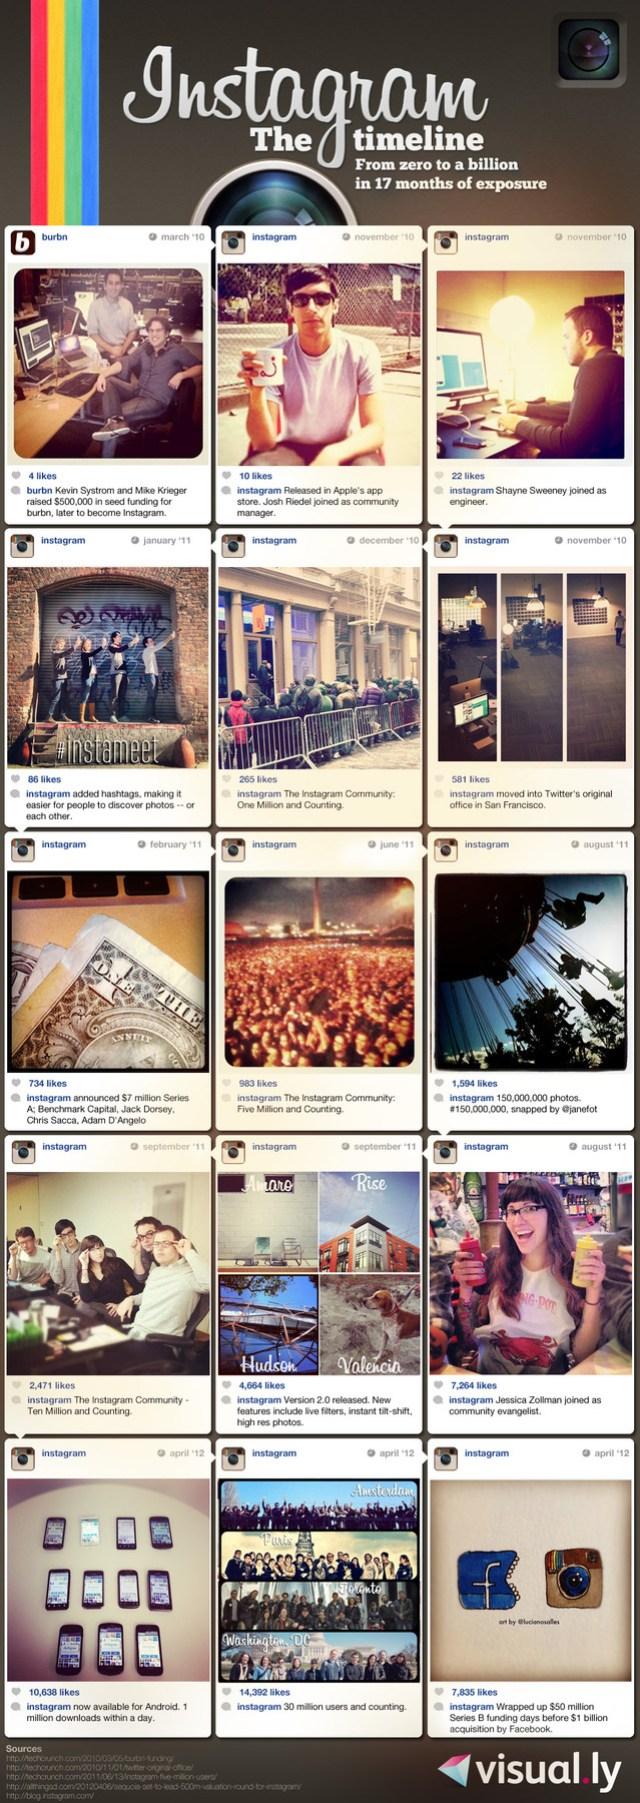 instagram-infographic.jpg